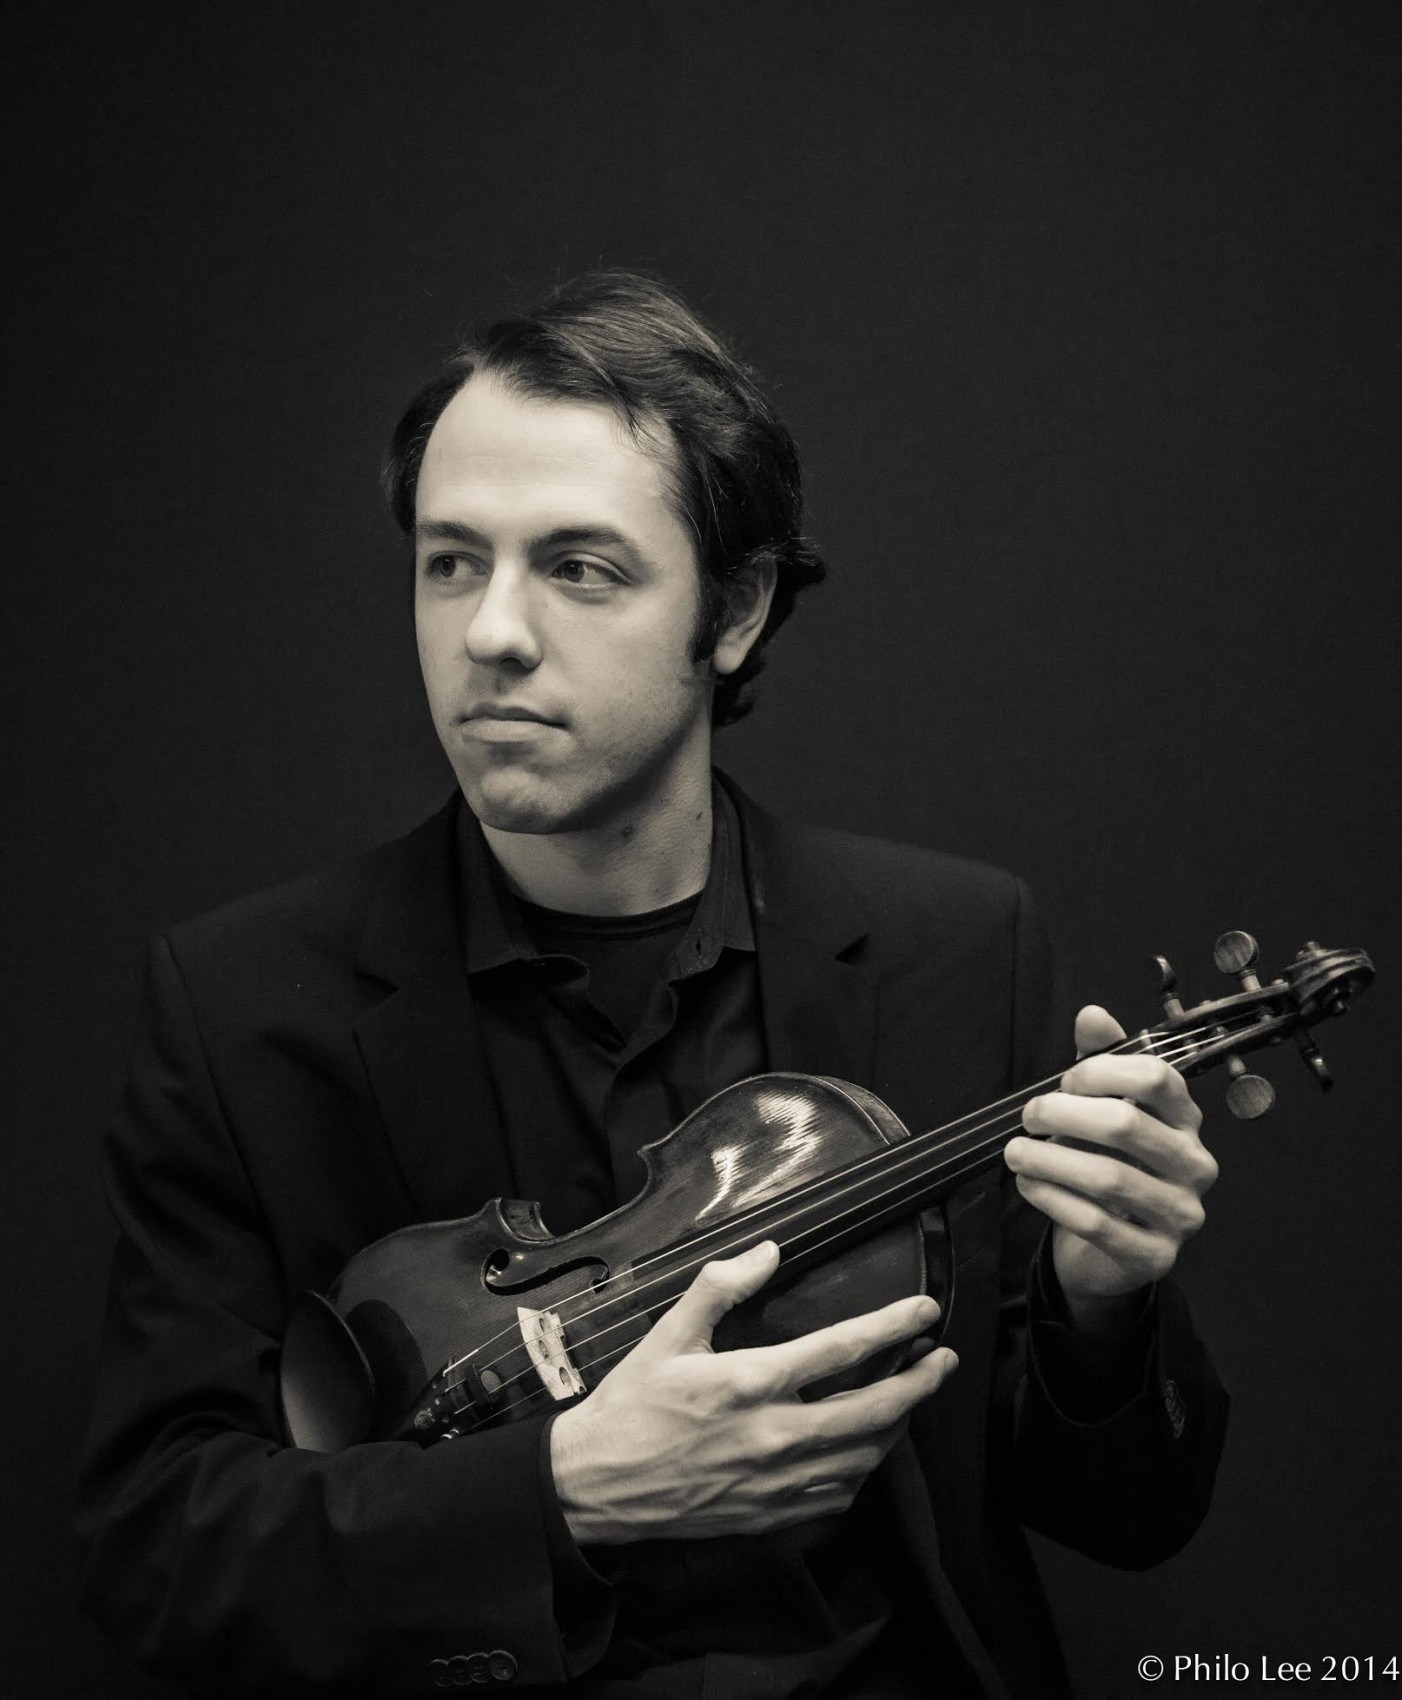 *Edson Scheid   Virtuoso violinist  Ensembles including Les Arts Florissants, Il Pomo d'Oro, Trinity Baroque Orchestra